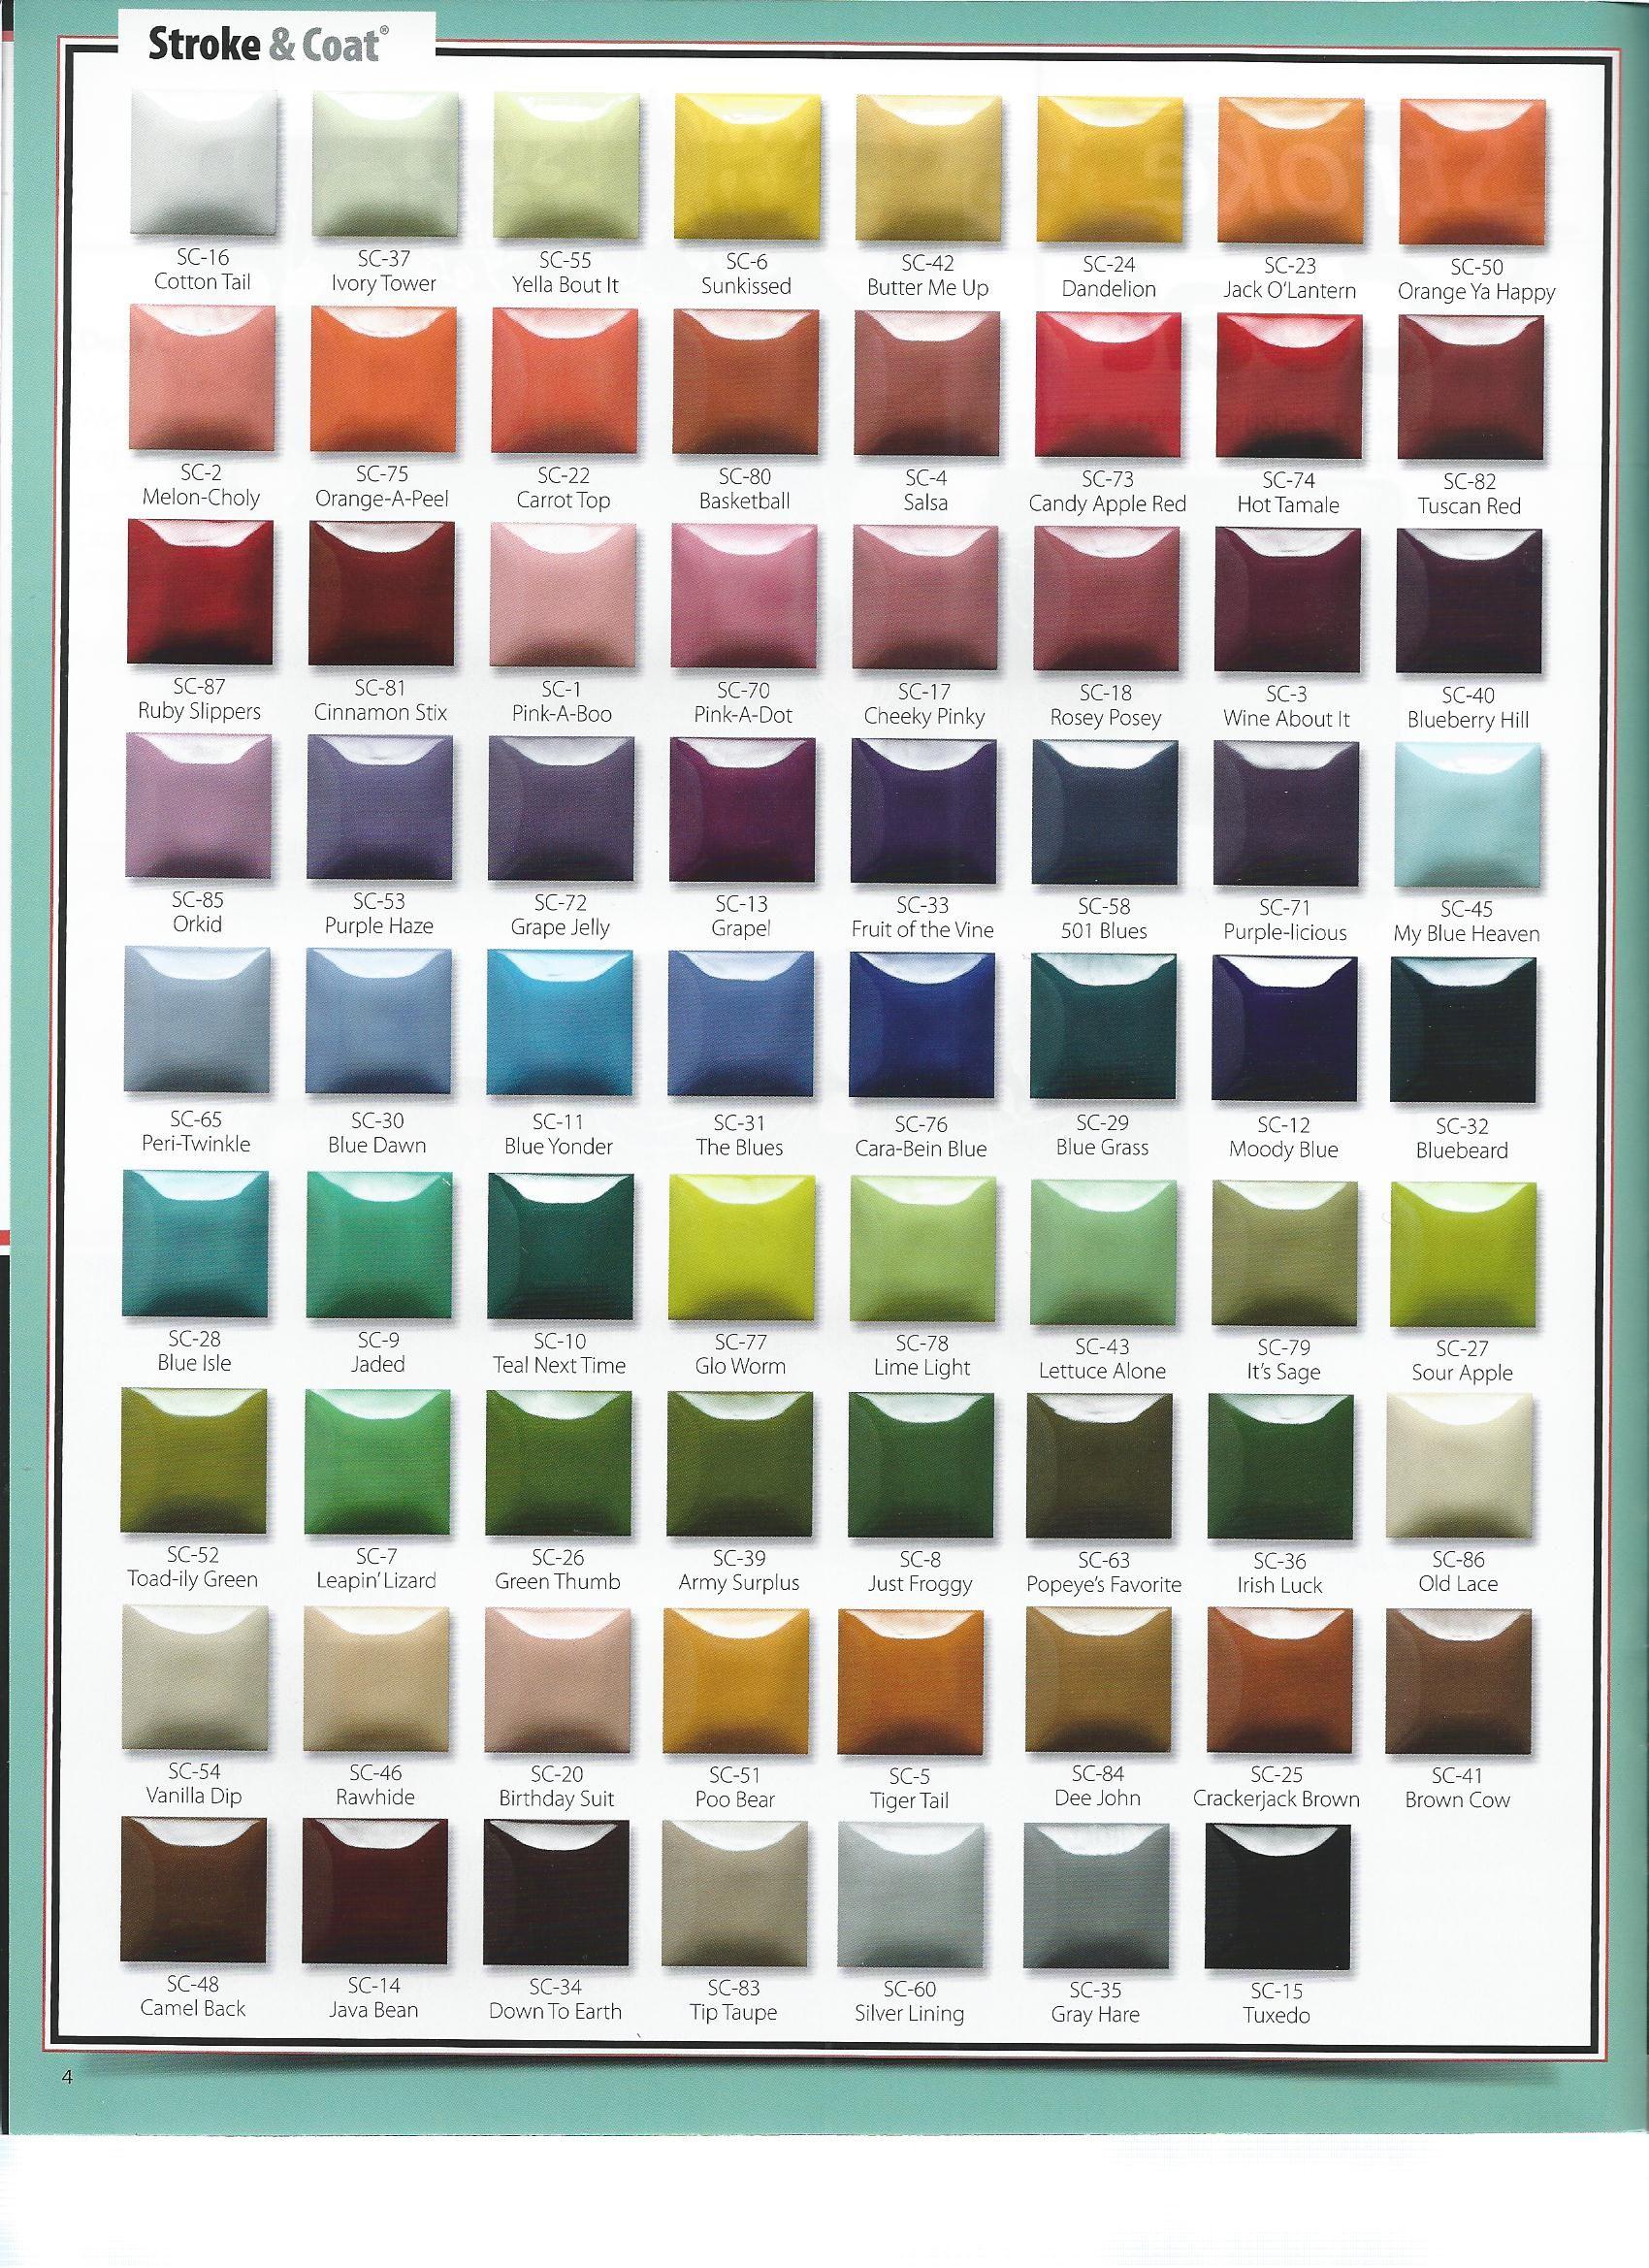 Bildergebnis Für Stroke And Coat Color Chart